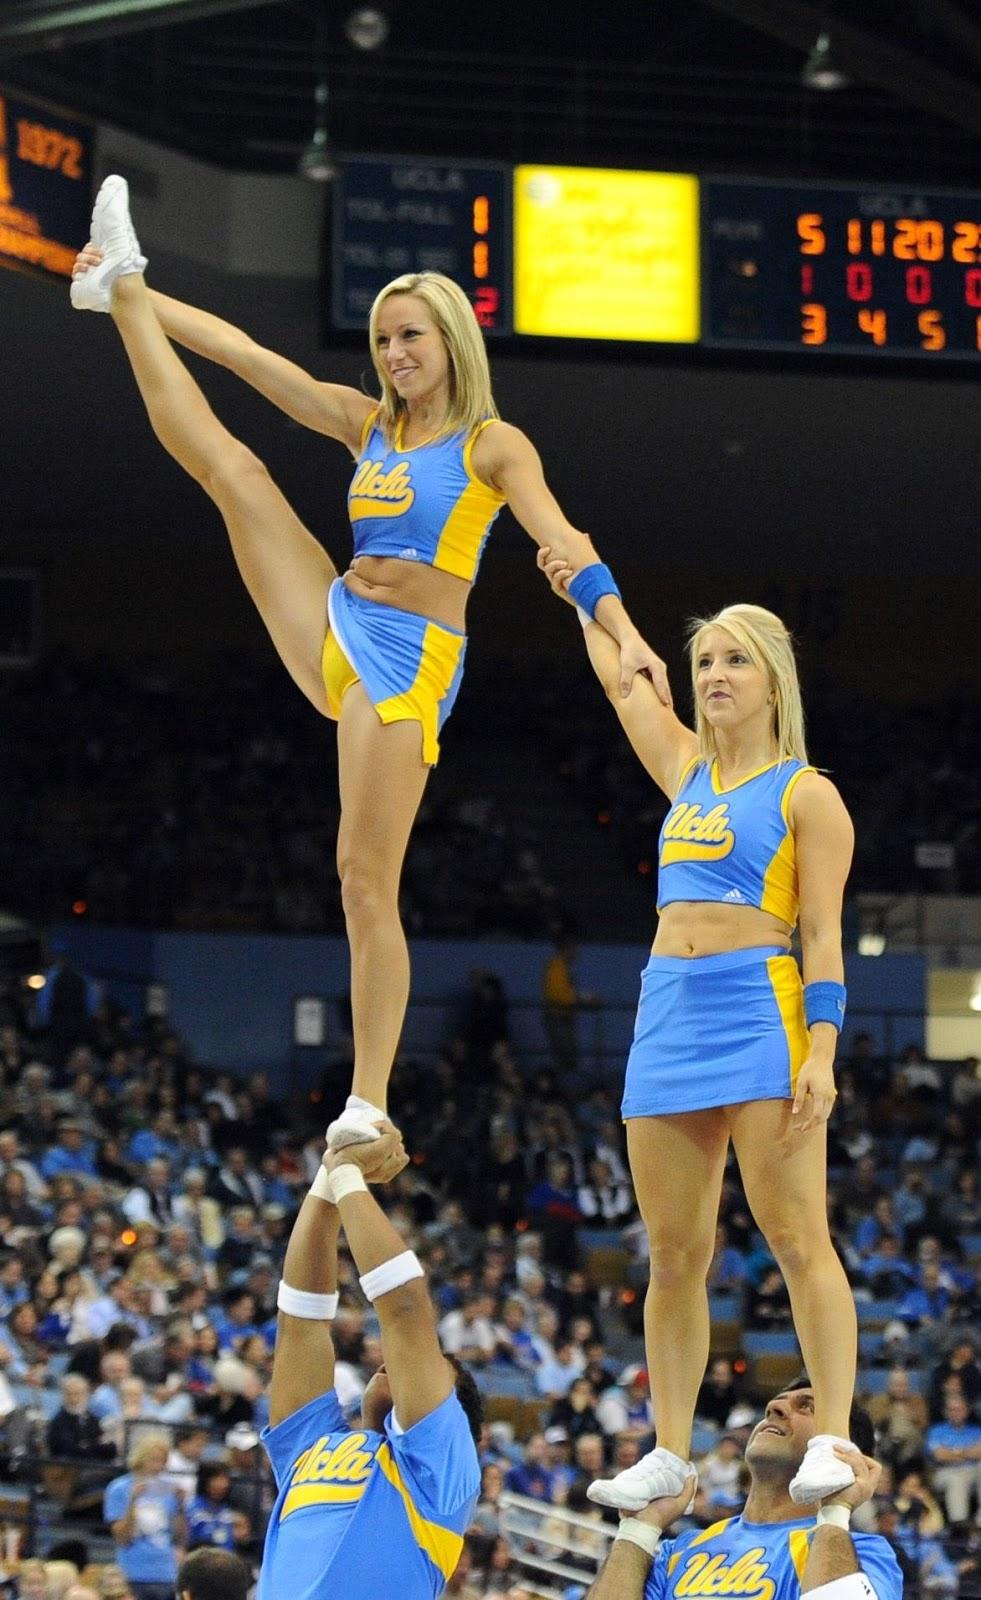 Hot college cheerleader slips that